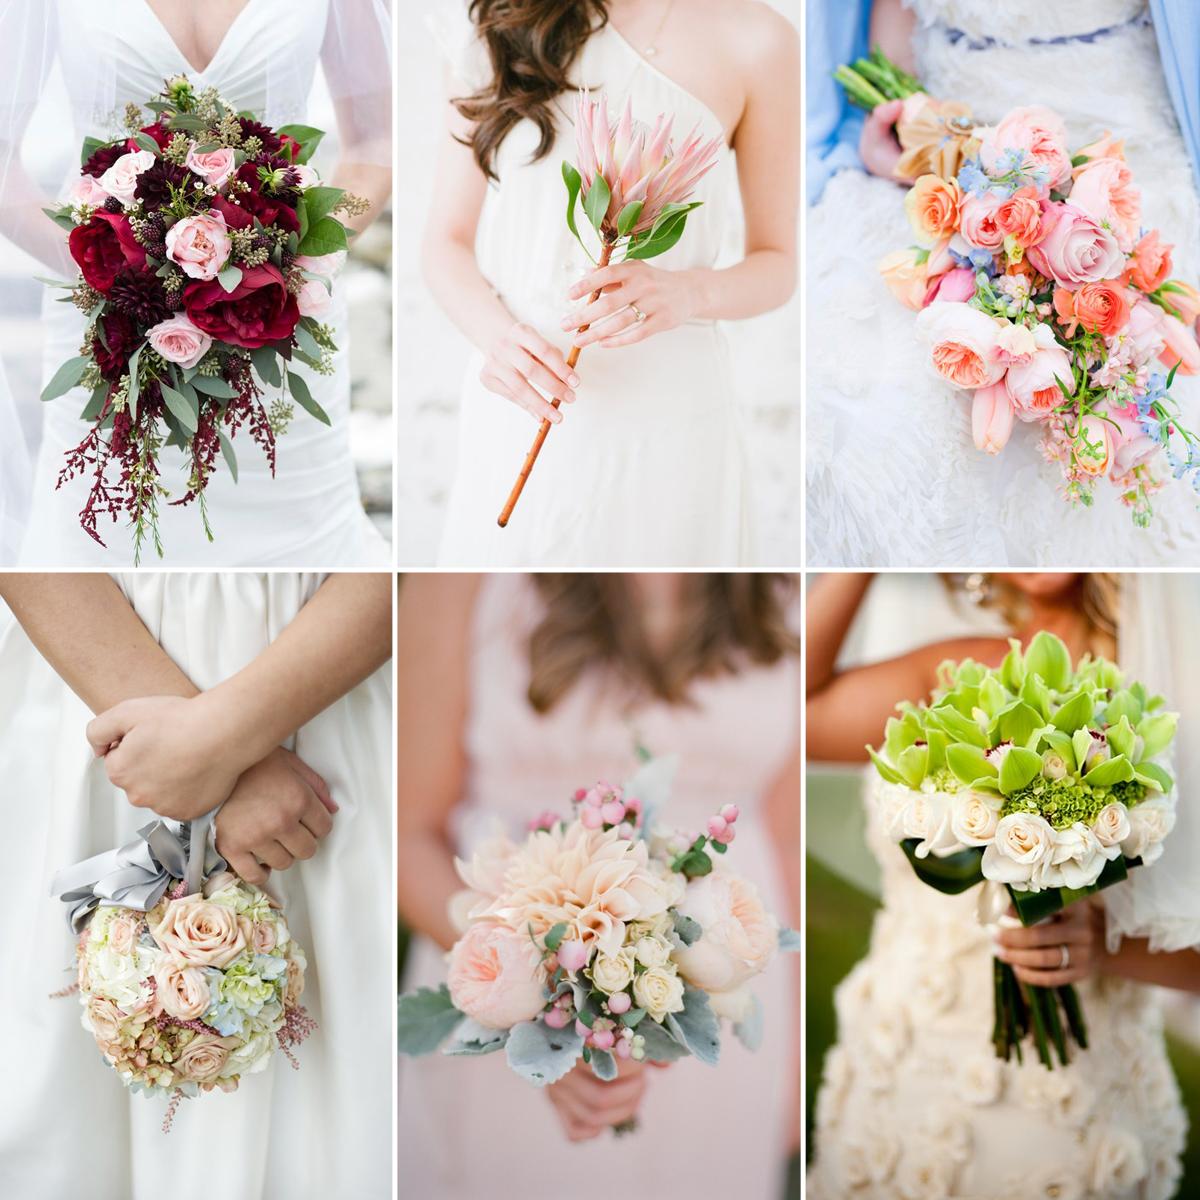 wedding bouquet flowers types photo - 1